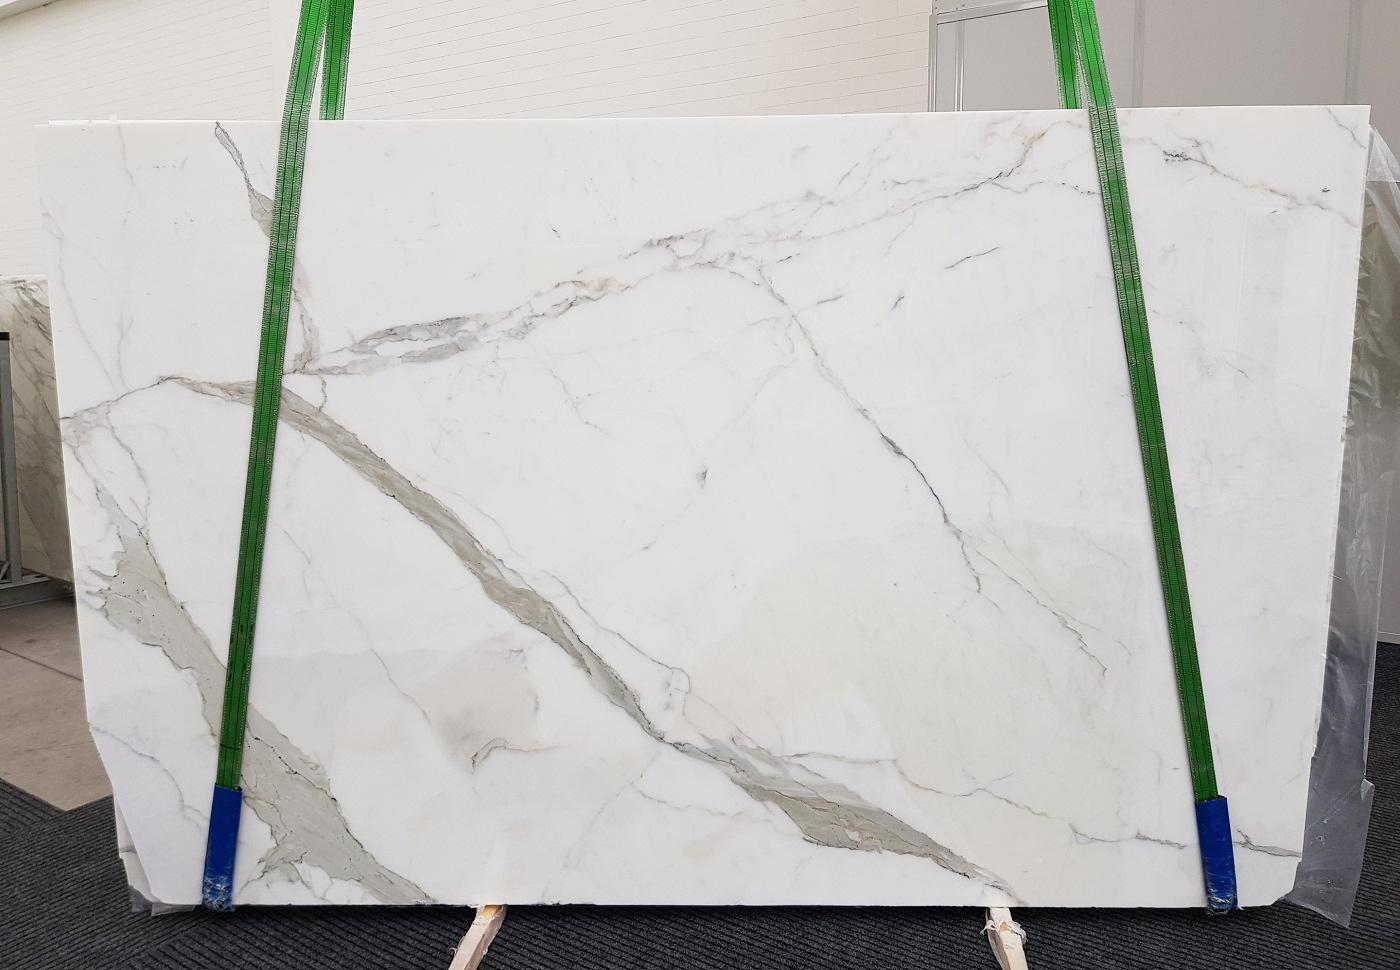 CALACATTA Suministro Verona (Italia) de planchas mates en mármol natural GL 1108 , Bund #5-35